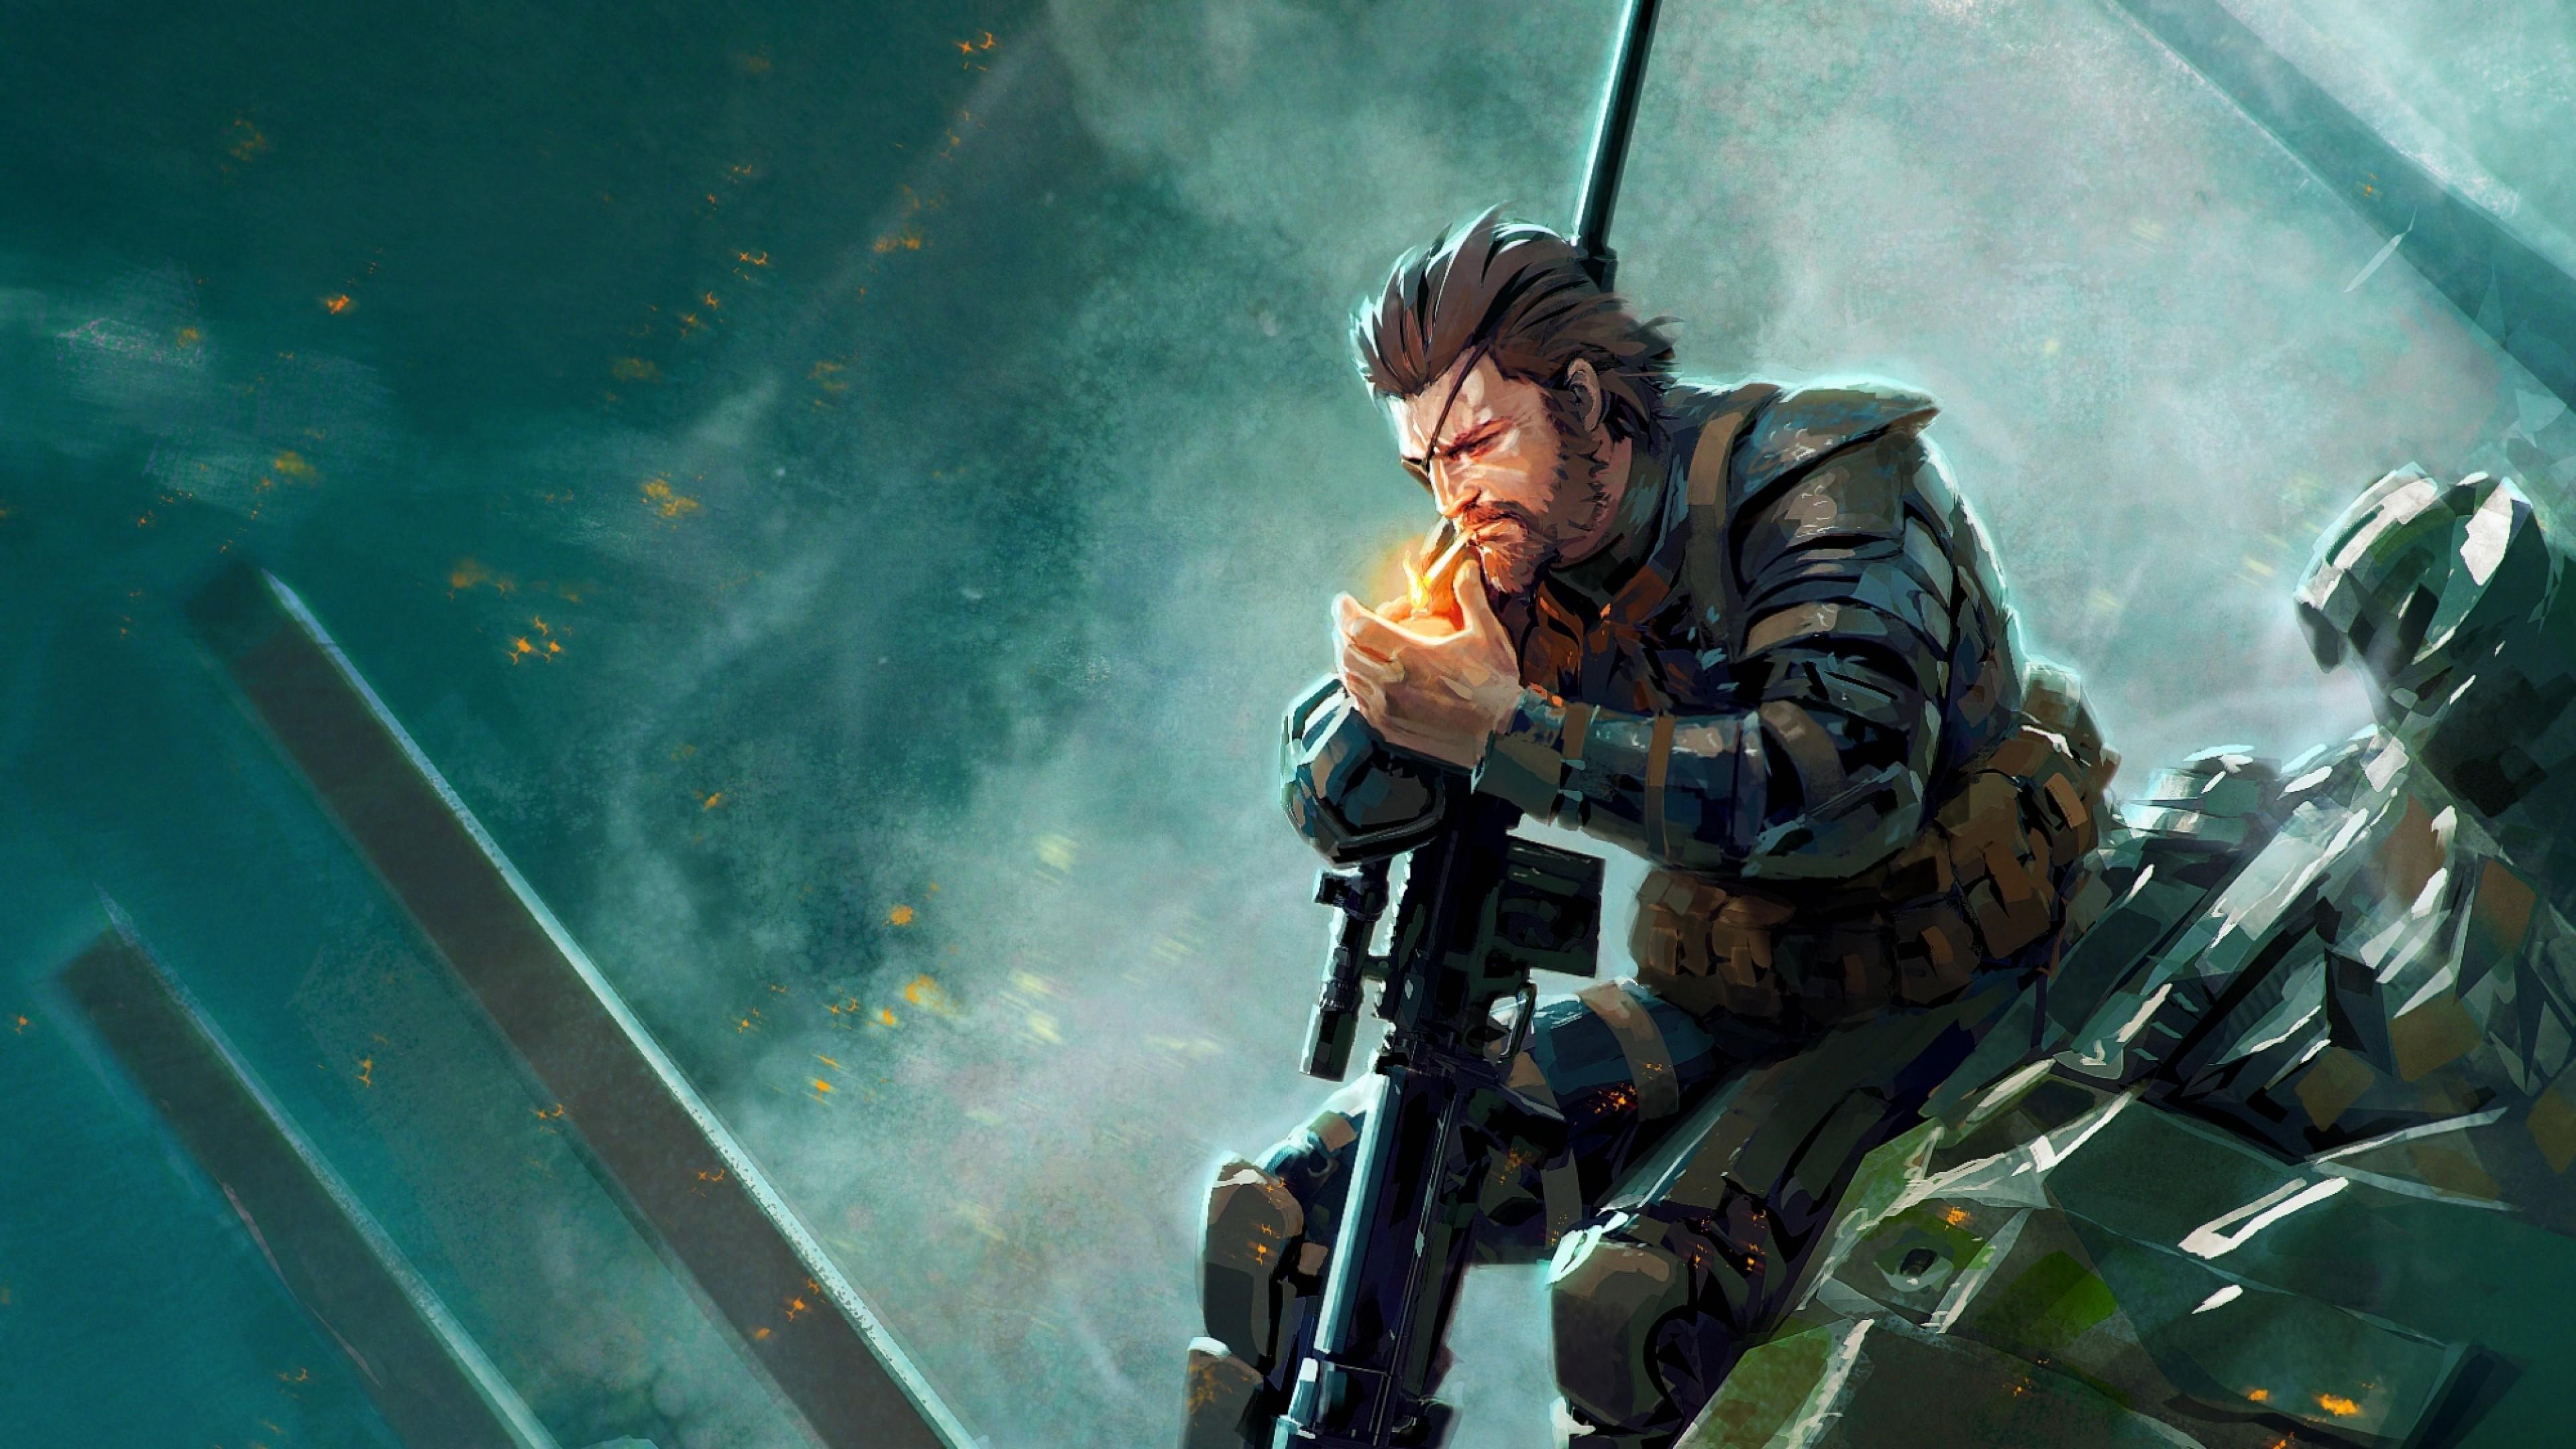 Metal Gear Solid V Mythbusters: Episode 6